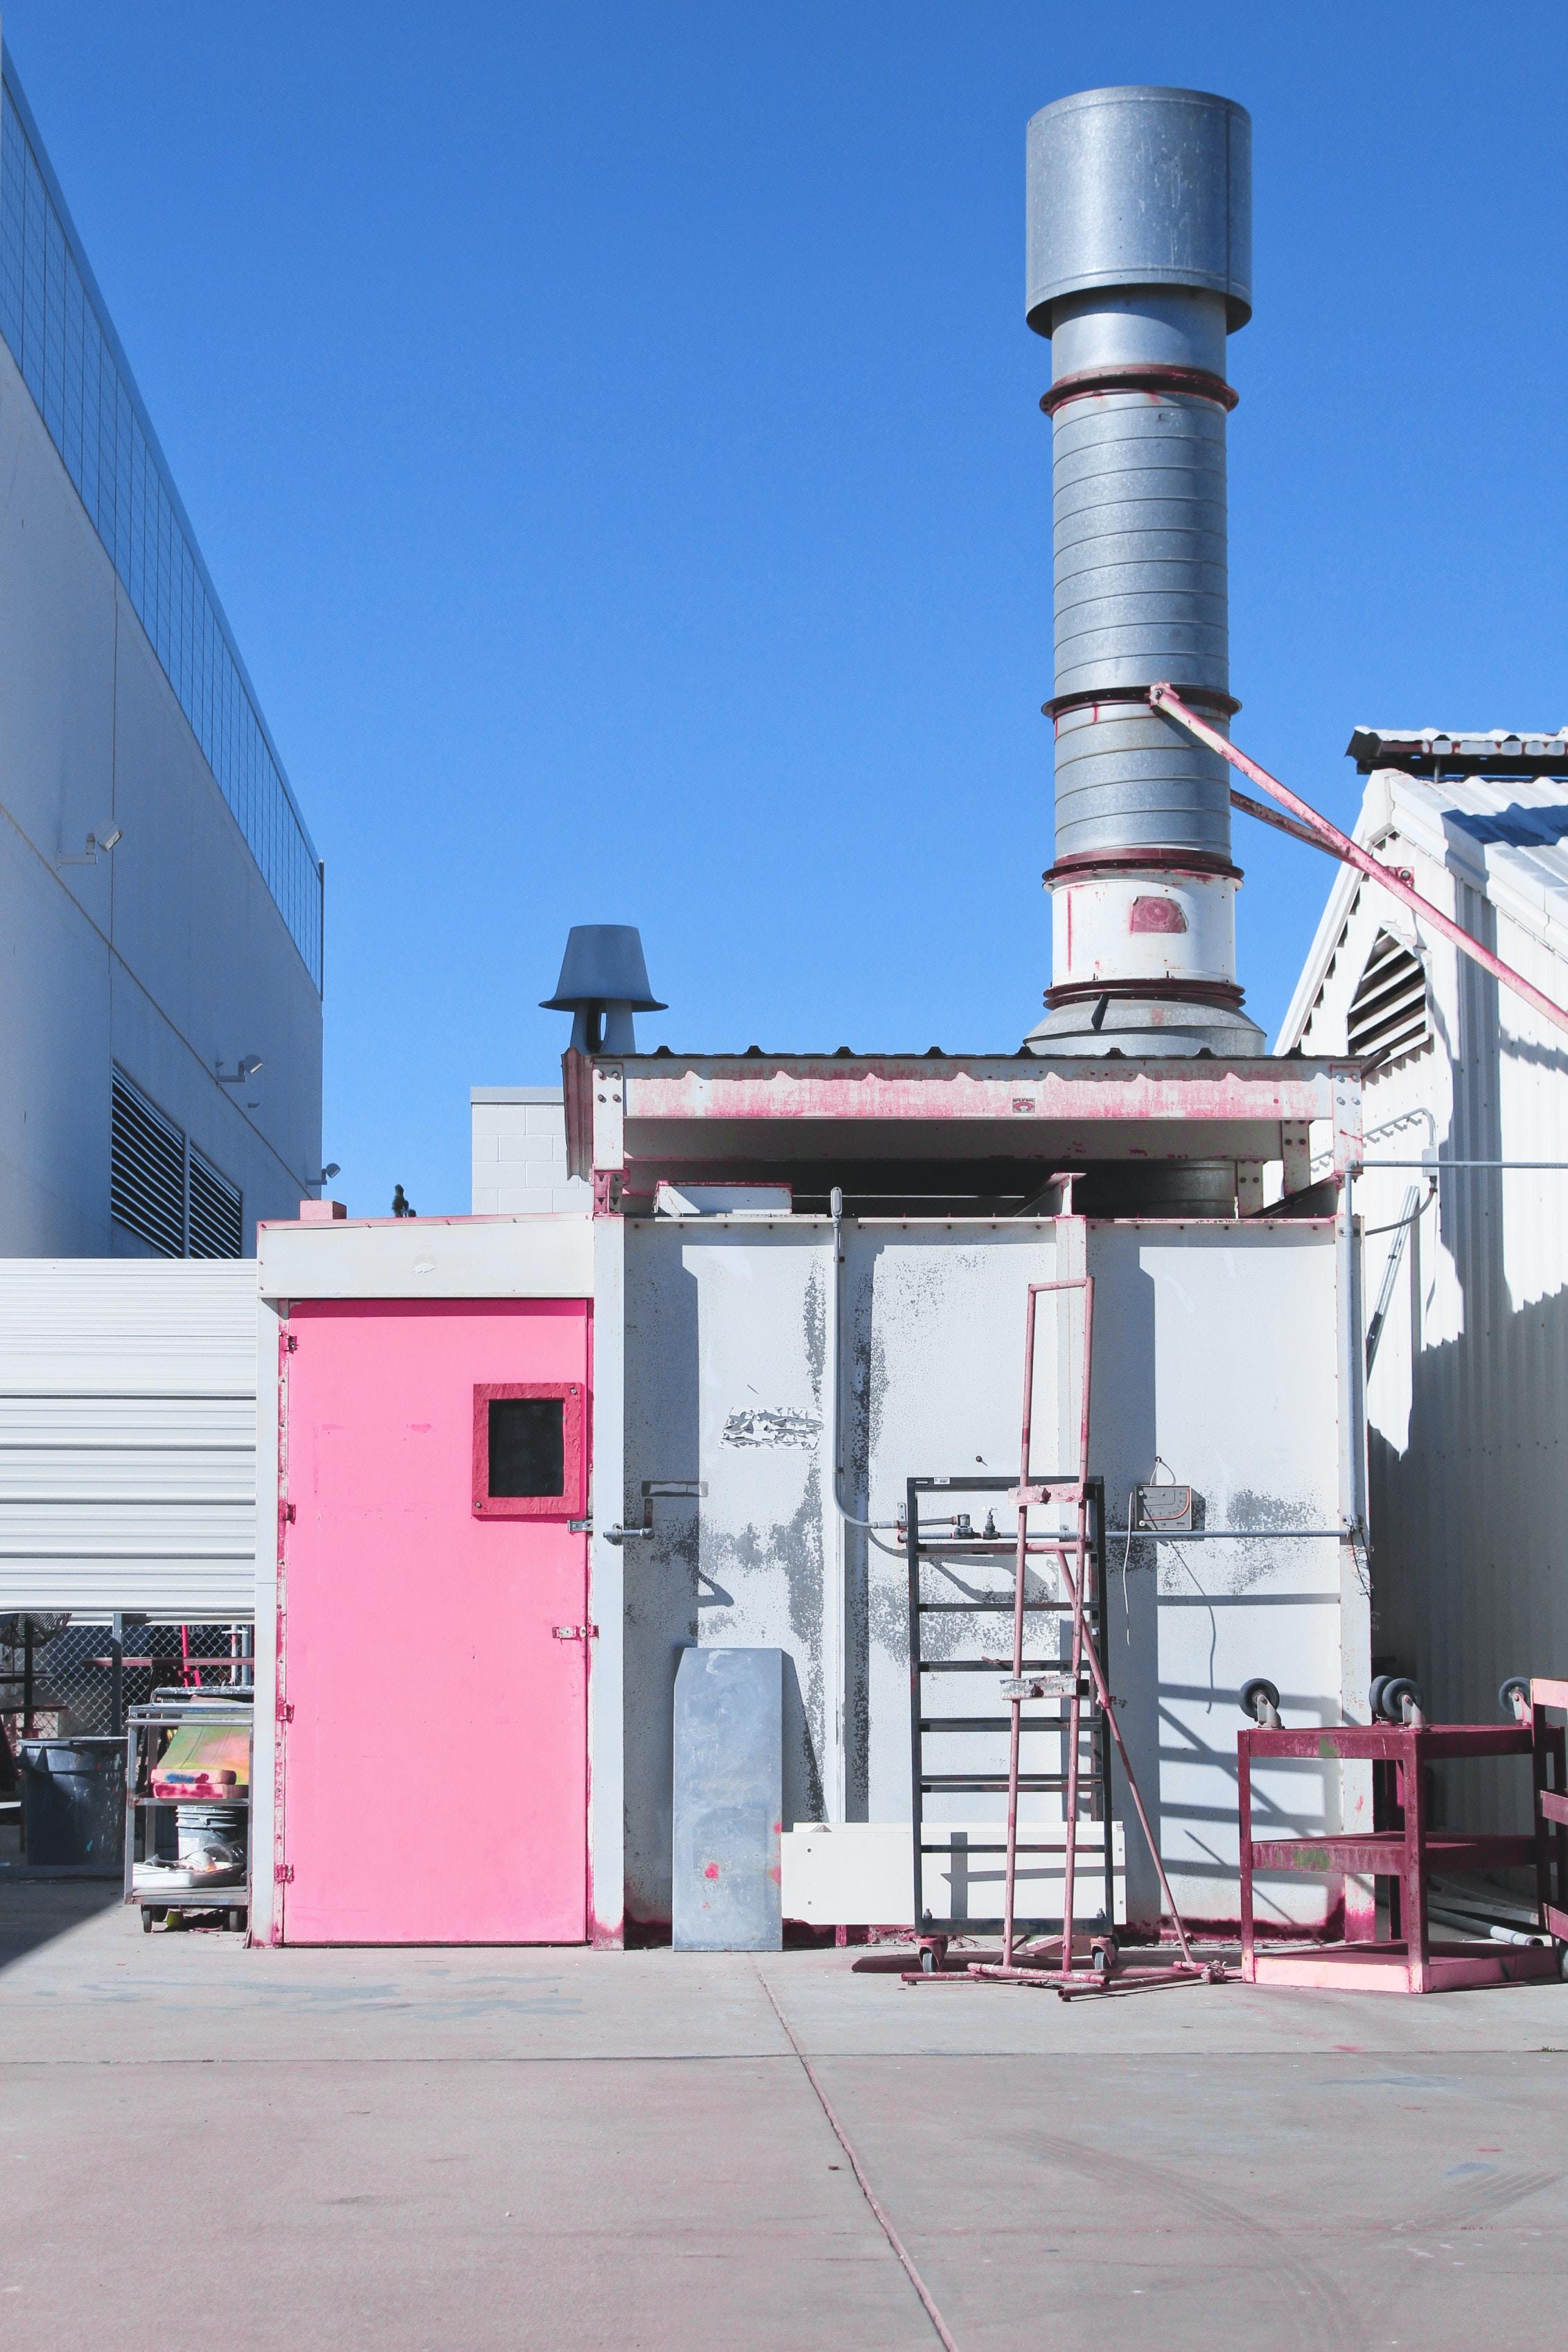 gray metal shed with pink door